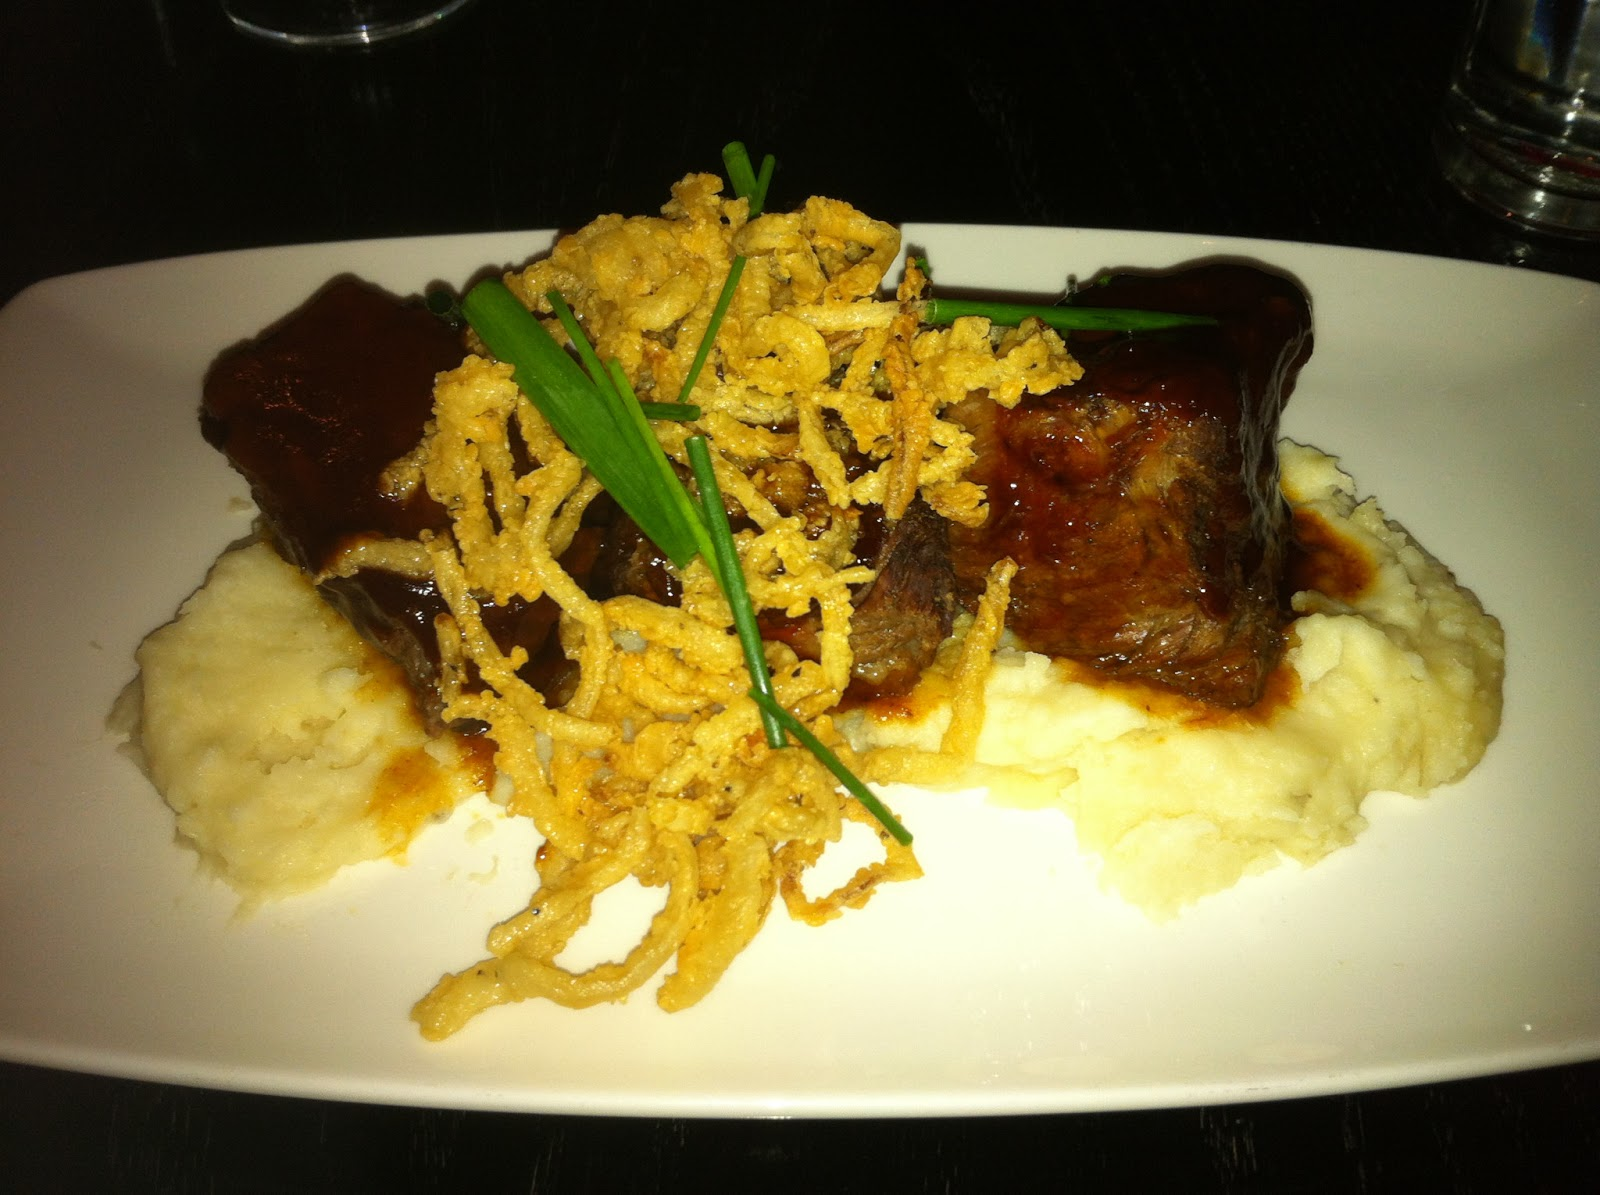 Dish Restaurant Dallas Short Ribs Braised BBQ Barbecue Barbeque Bar-B-Que